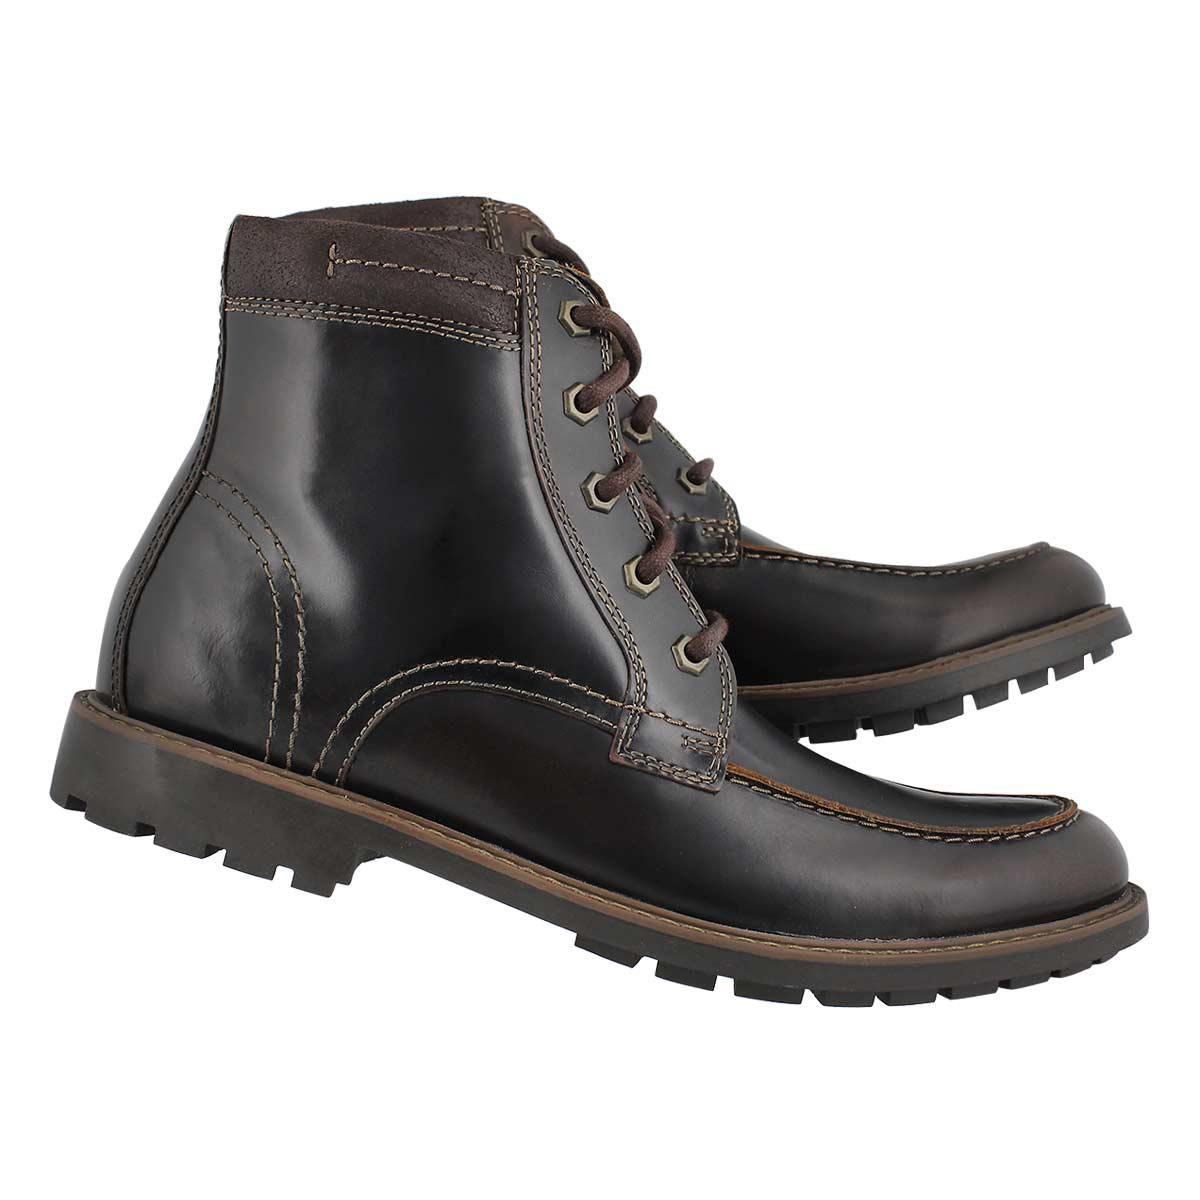 Mns Curington High dkbrn laceup ank boot